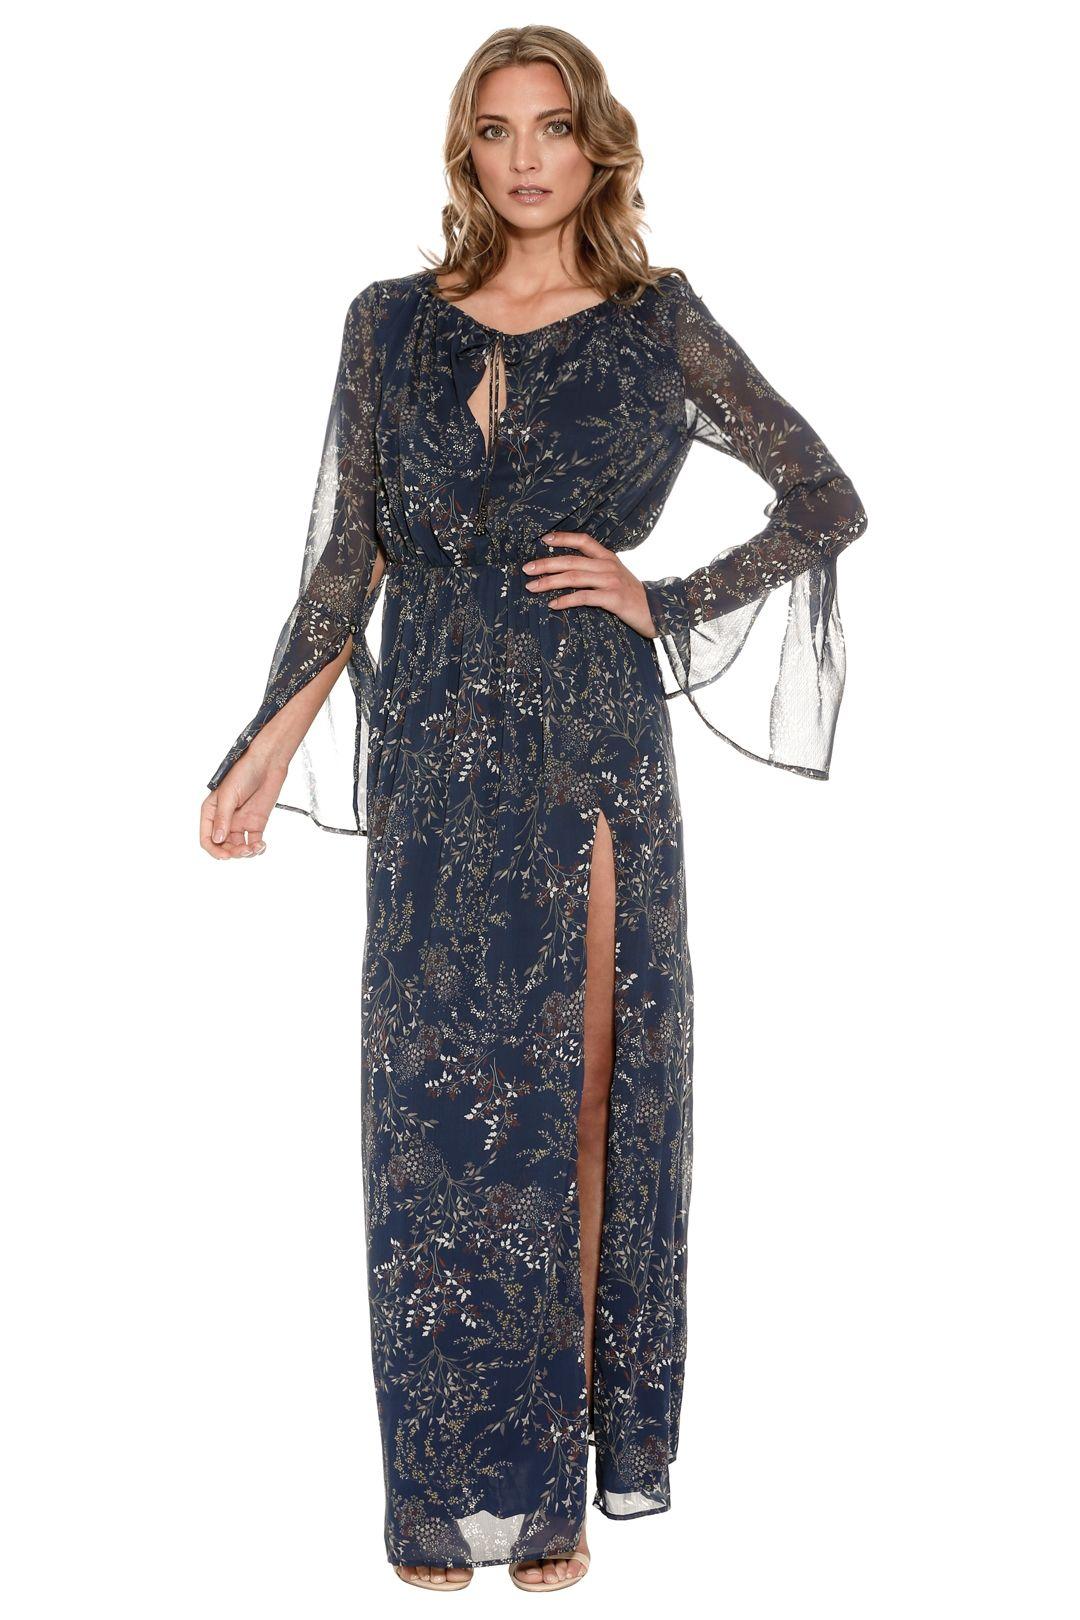 The Jetset Diaries - Mediterranean Maxi Dress - Blue - Side 2